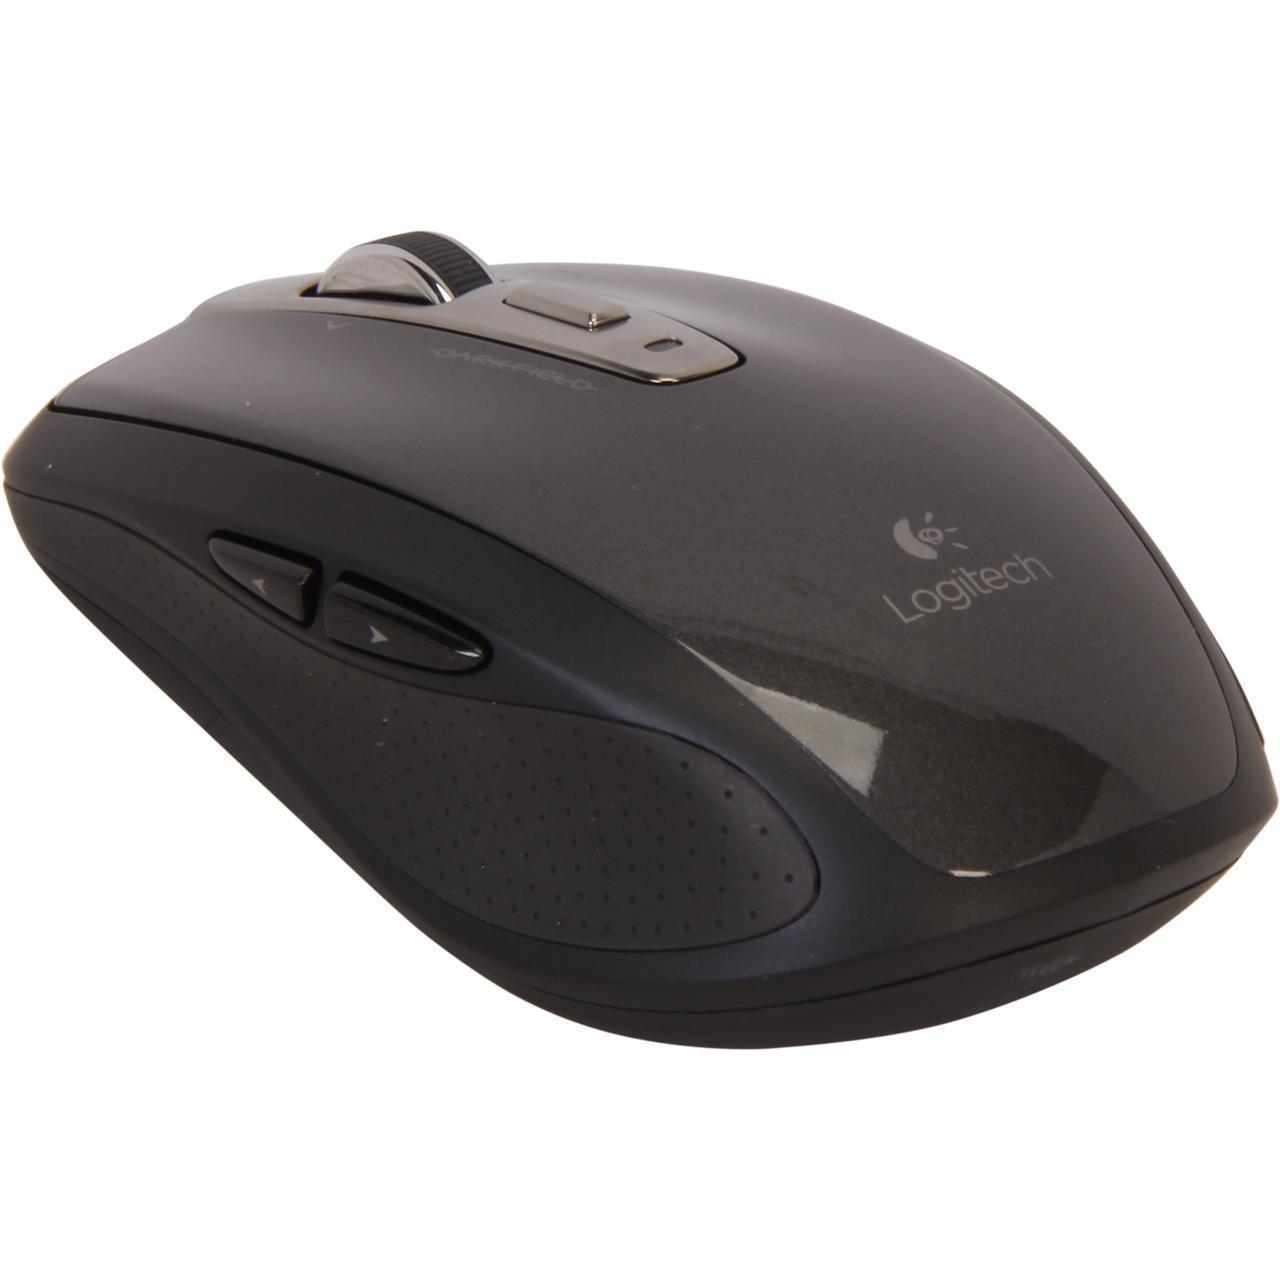 Logitech MX Anywhere Mouse Wireless